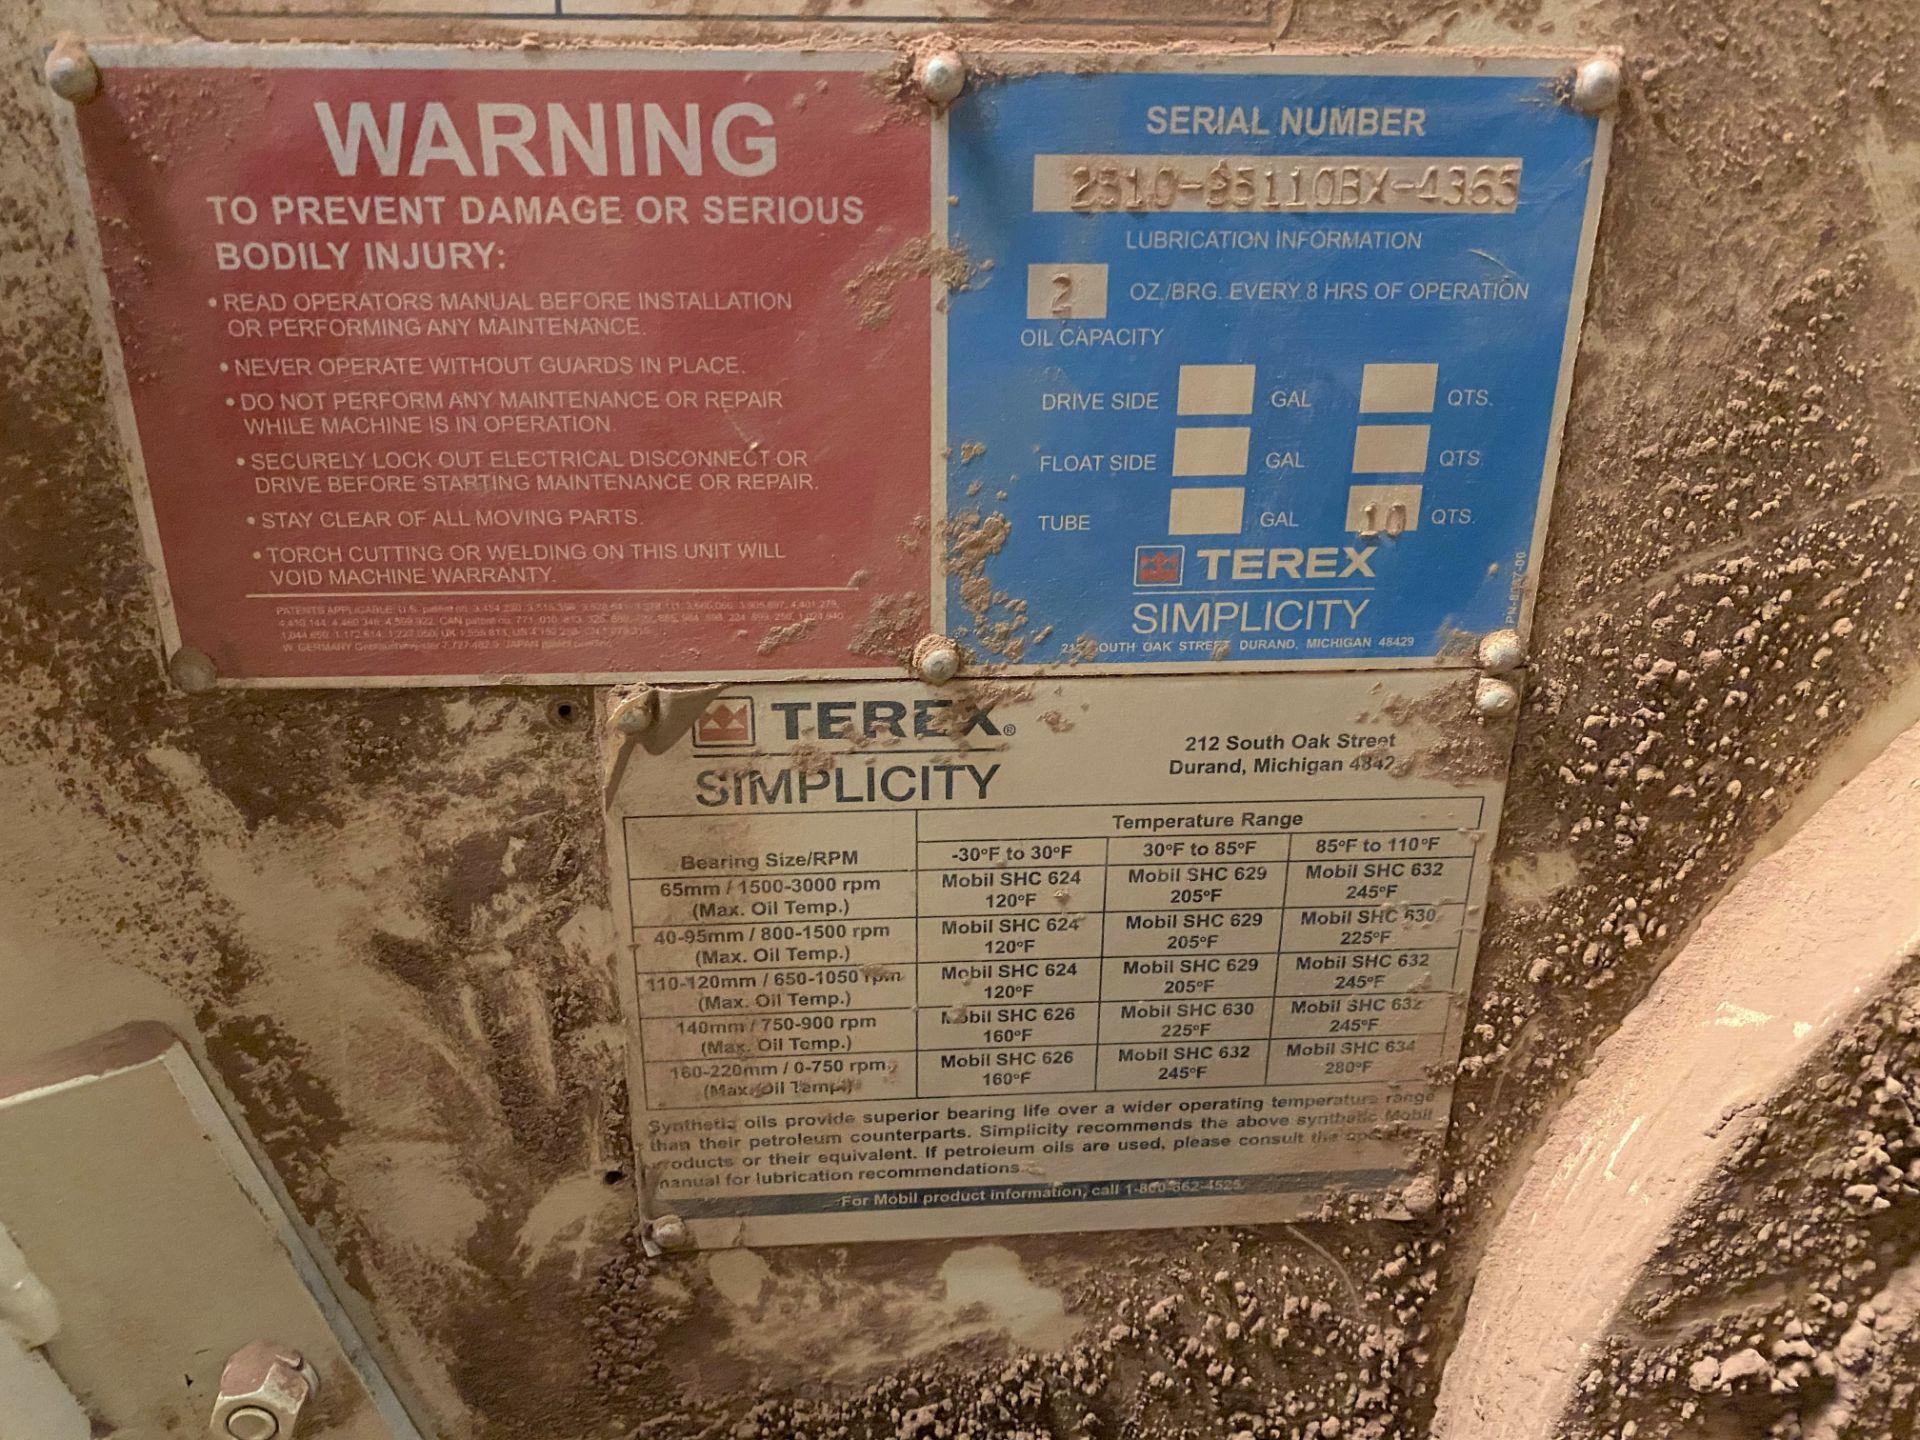 TEREX SIMPLICITY VIBRATORY, DOUBLE DECK, 6' X 12' SCREENER, W/ 20 KVA SCREEN HEATING TRANSFORMER, - Image 2 of 15